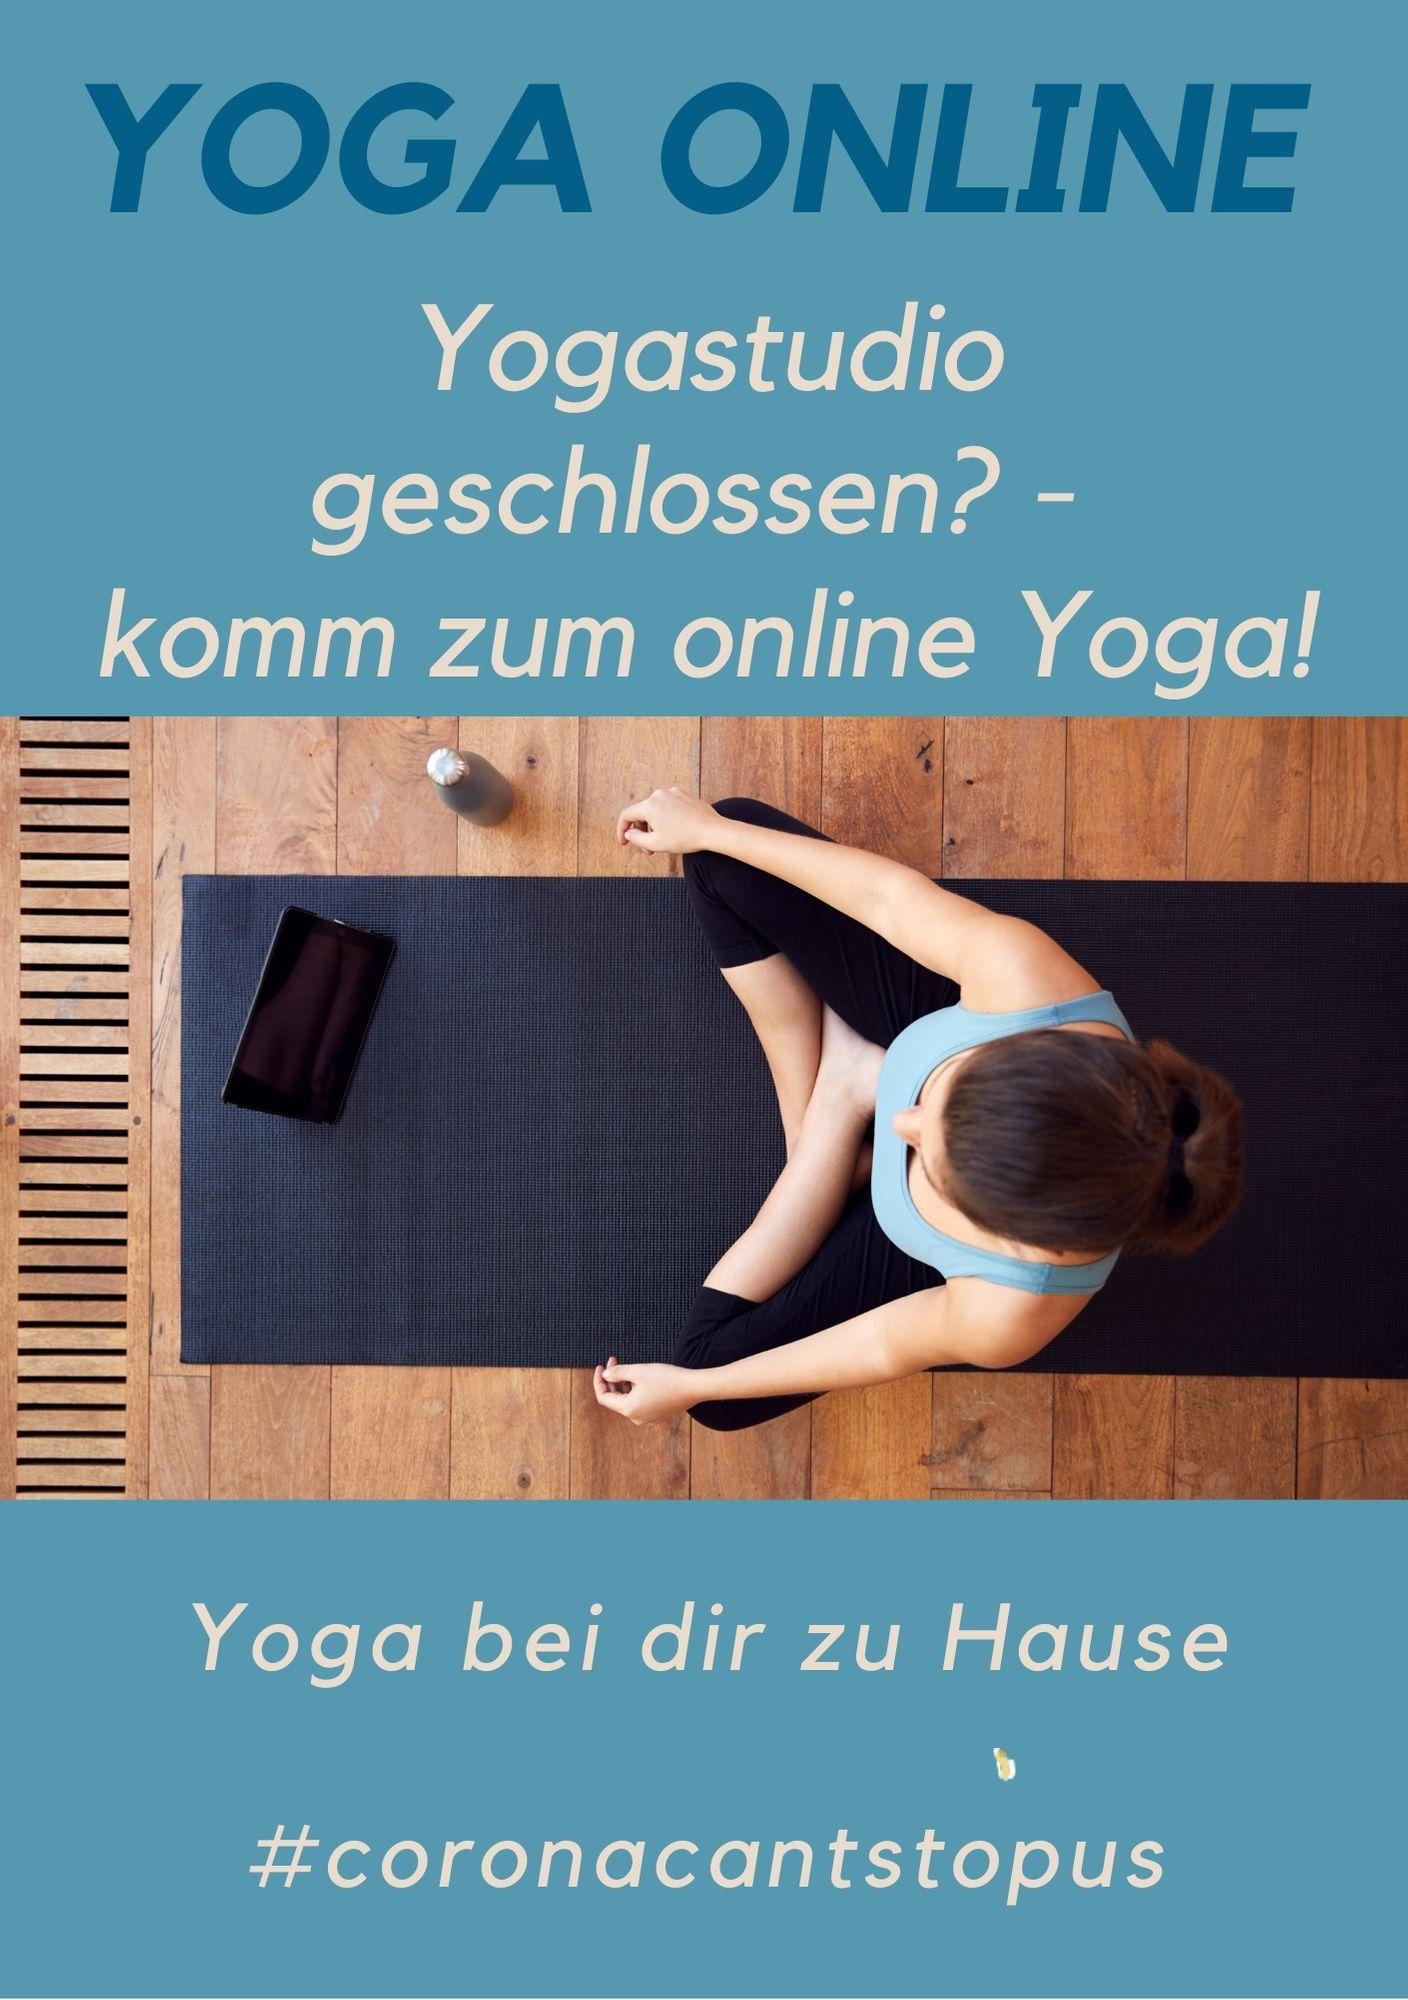 Yogakurse online, Yoga by Veronika